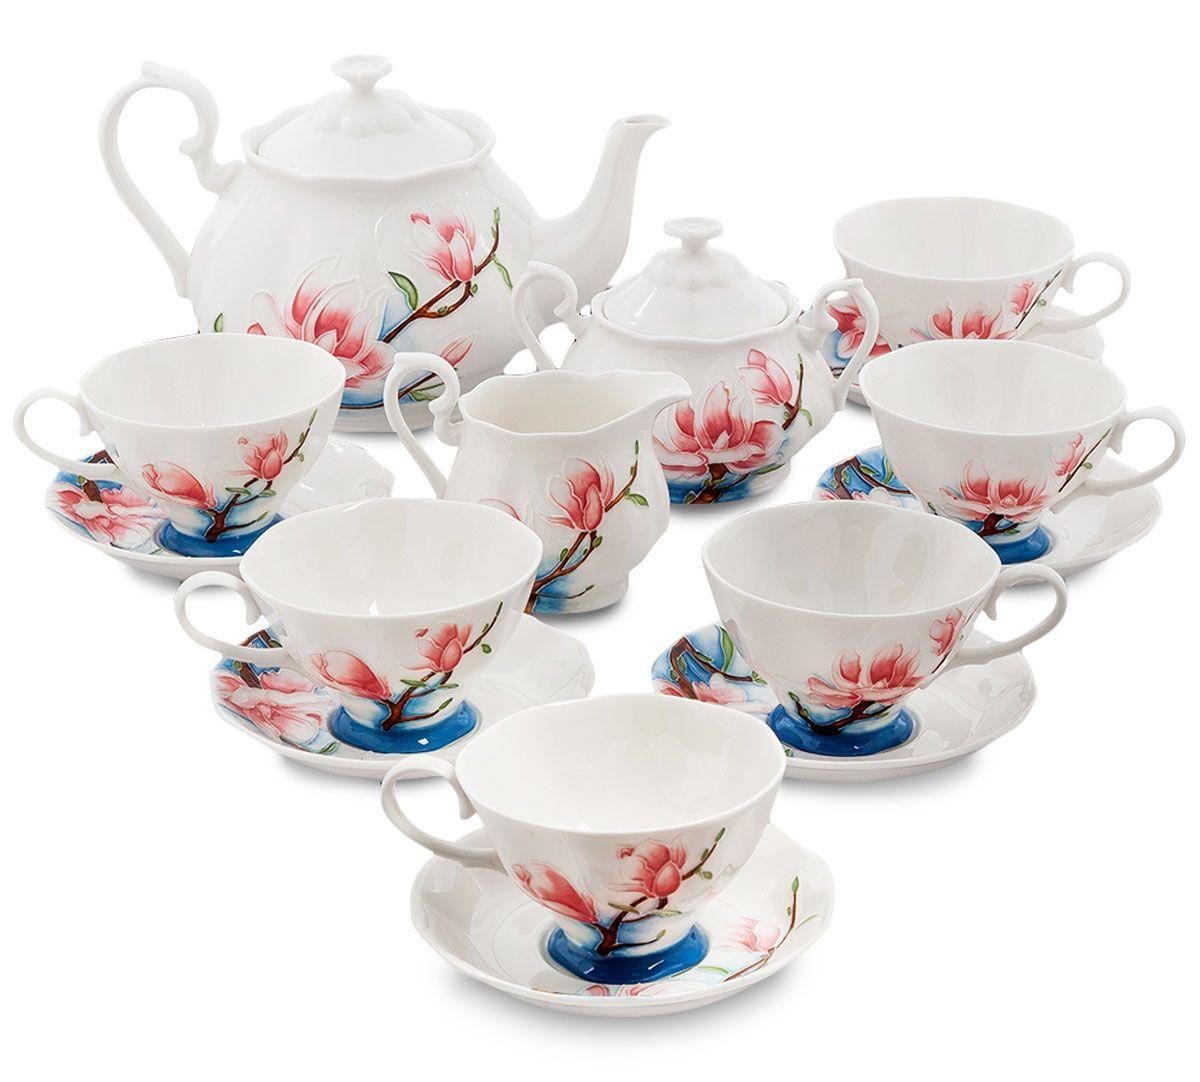 Сервиз чайный Pavone Цветущая сакура, 15 предметов. 451572VT-1520(SR)Объем чайника: 1,25 лОбъем сахарницы: 400 мл Объем молочника: 250 мл Объем чашки: 200 млДиаметр блюдца: 14 см.